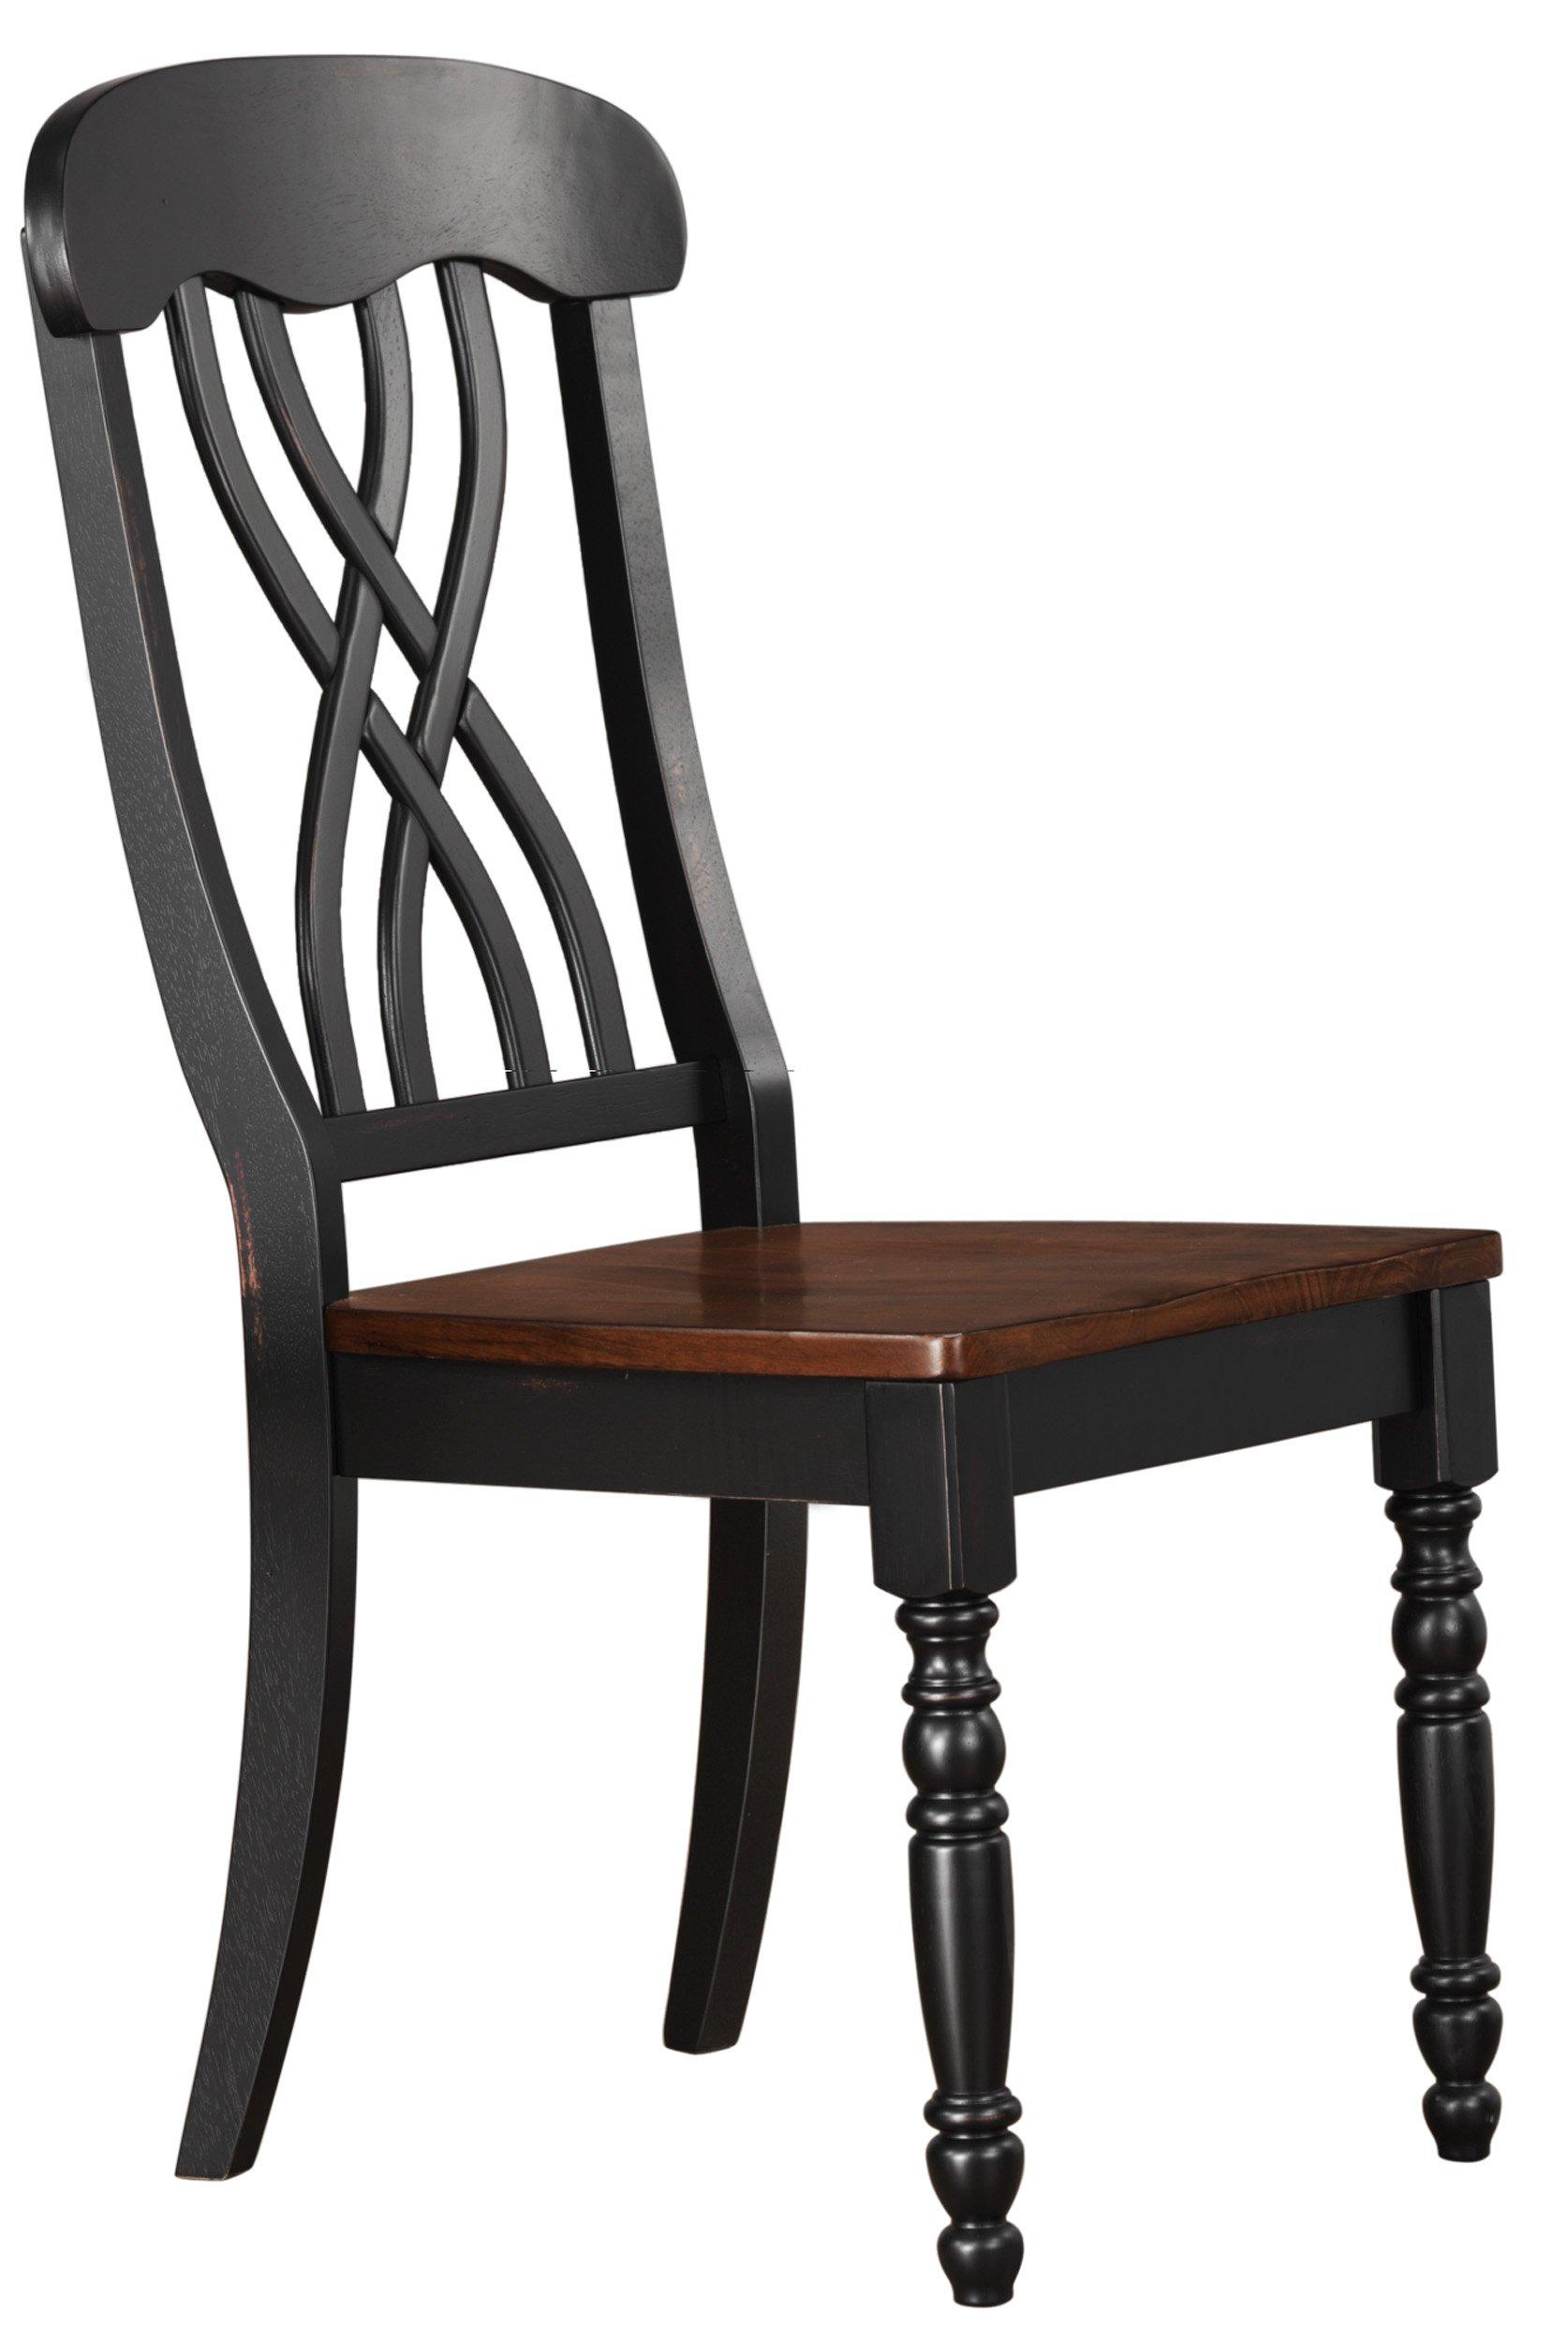 Homelegance Ohana 2 Piece Pack Causal Dining Chairs, Black & Cherry